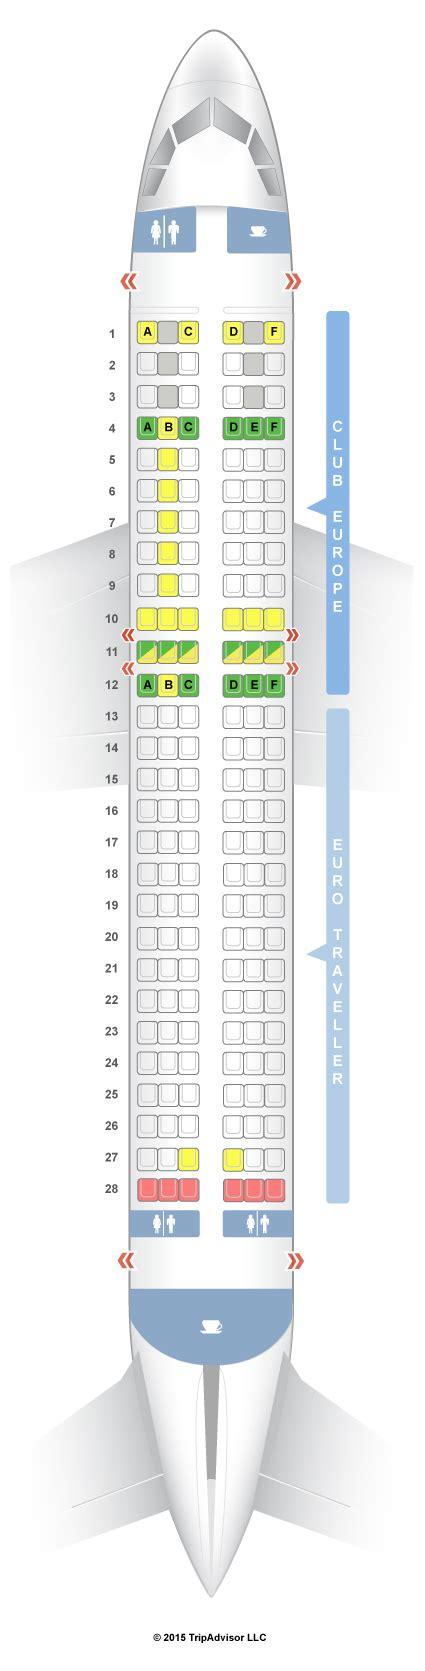 ba a321 seat map seatguru seat map airways airbus a320 320 european